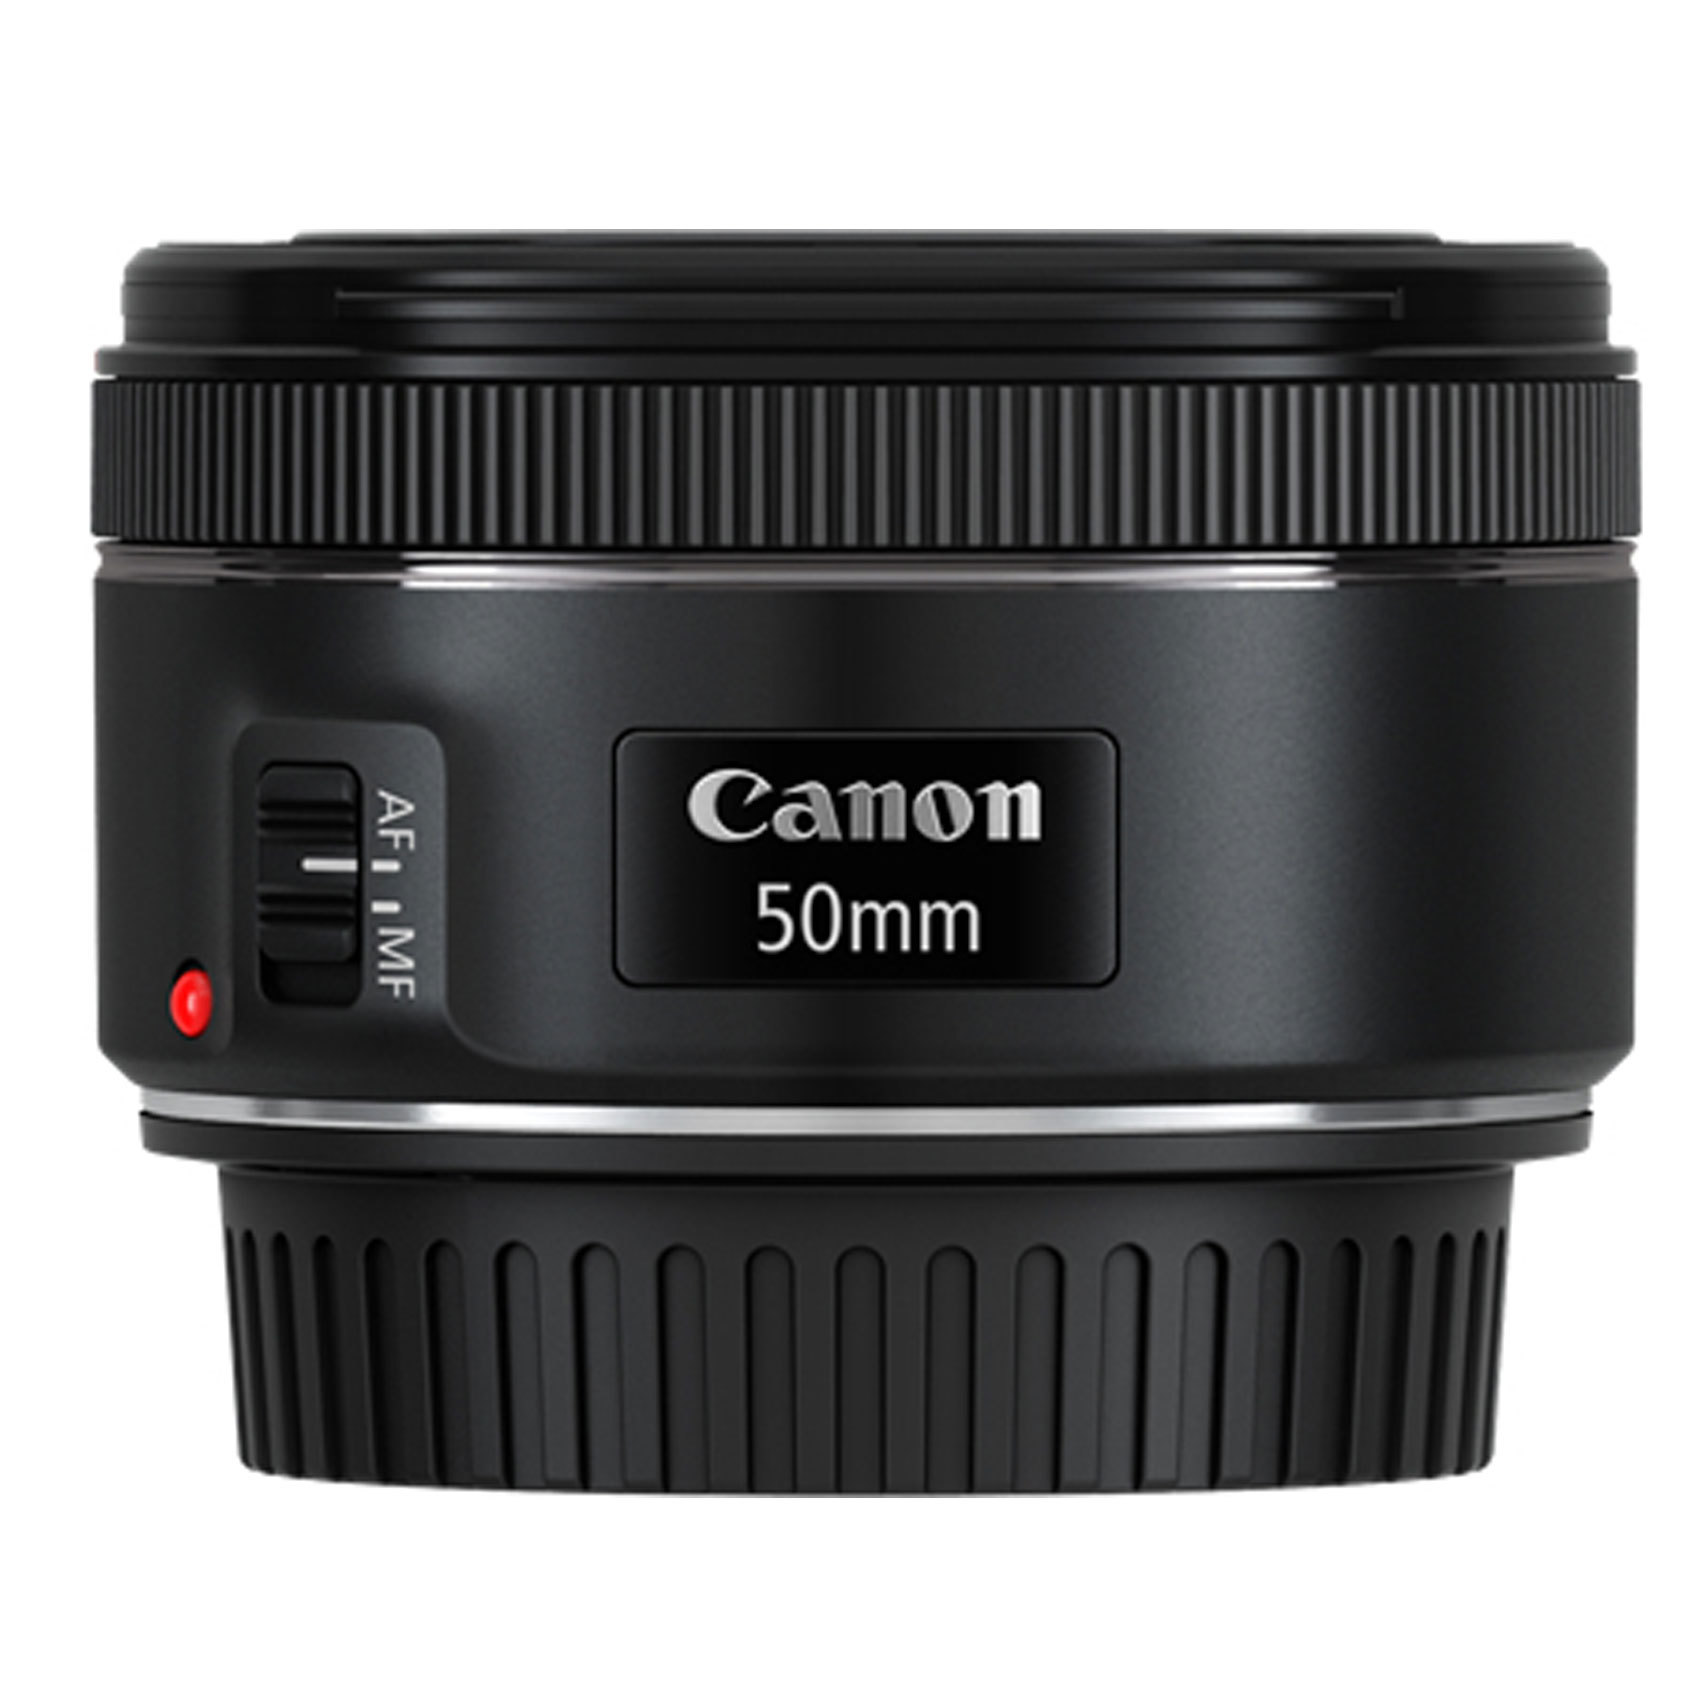 CANON LENS EF 50MM 1.8 STM